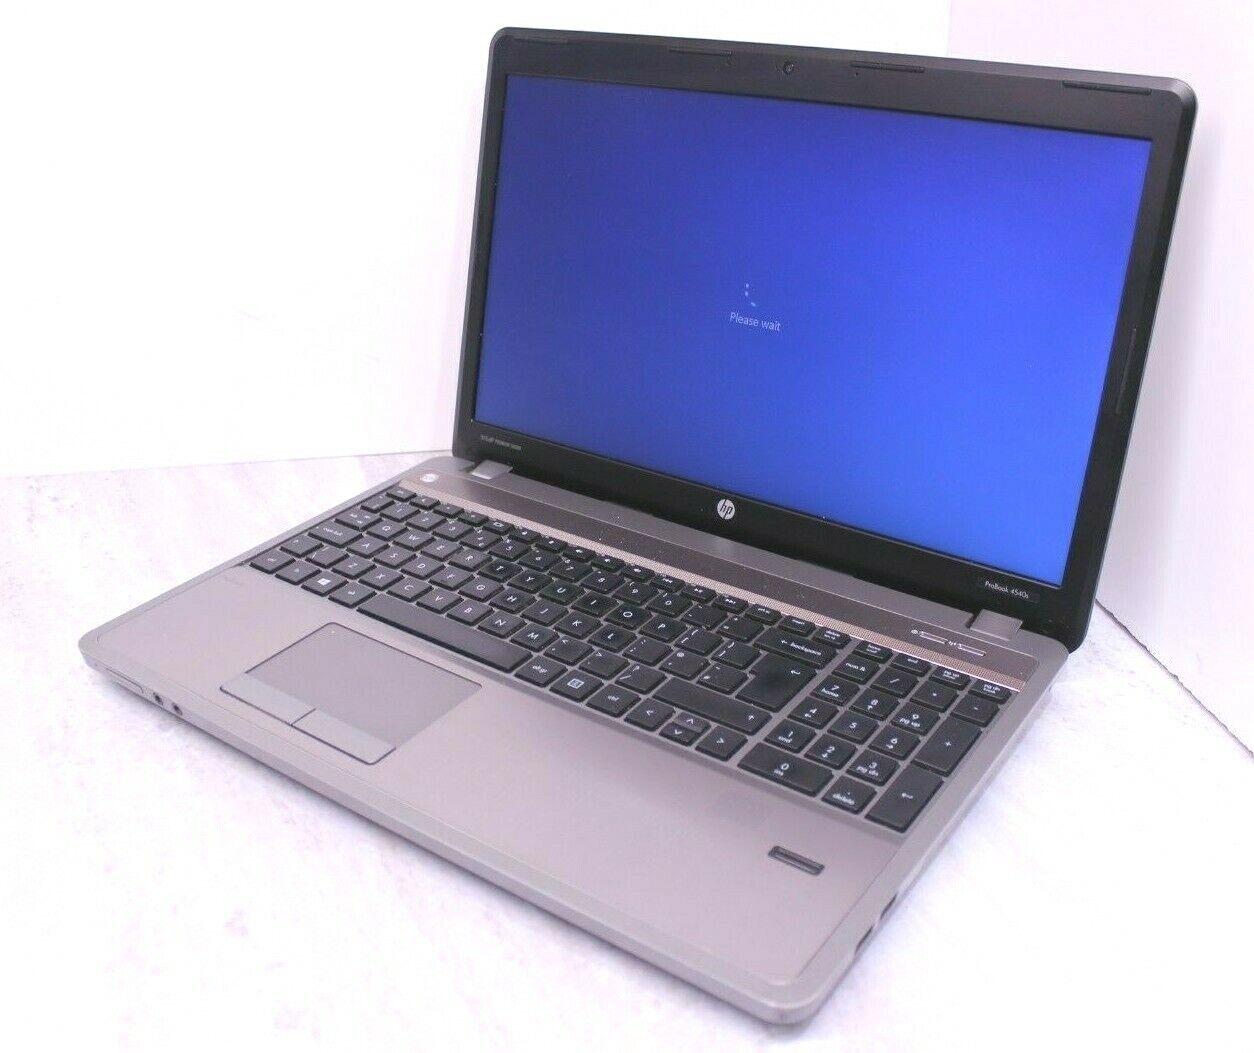 Laptop Windows - HP Probook 4540s Windows 10 15.6 Laptop Intel i5 3210m 3rd 2.5Ghz 4Gb 500GB HDD